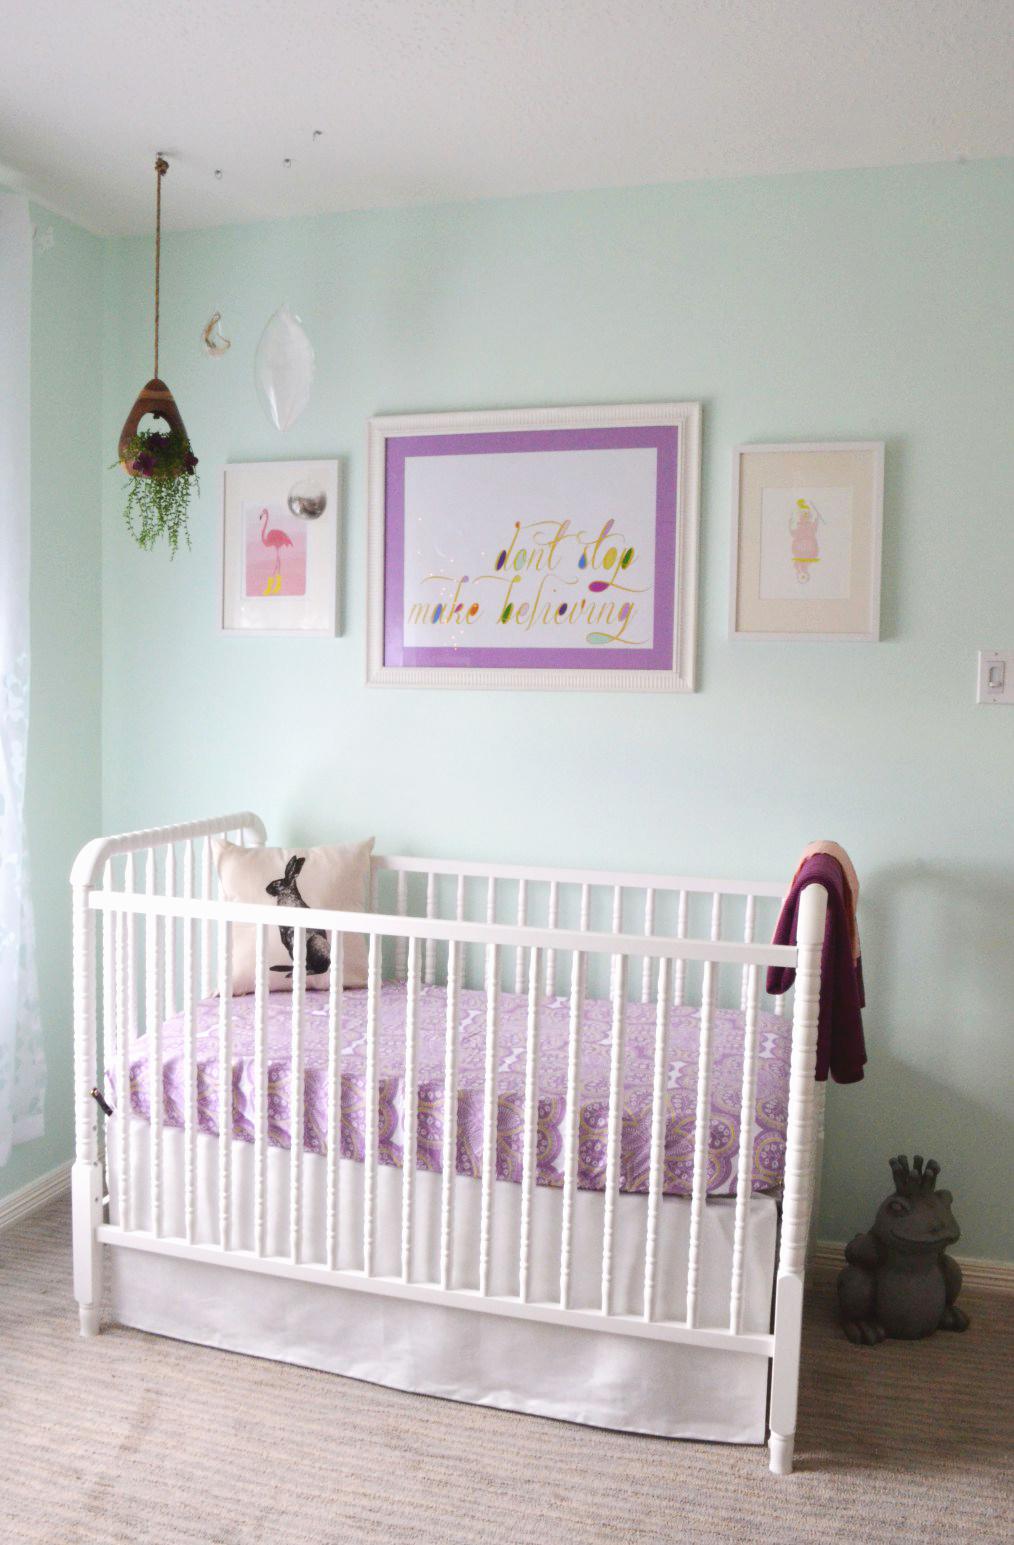 Make Believe Nursery 1.jpg